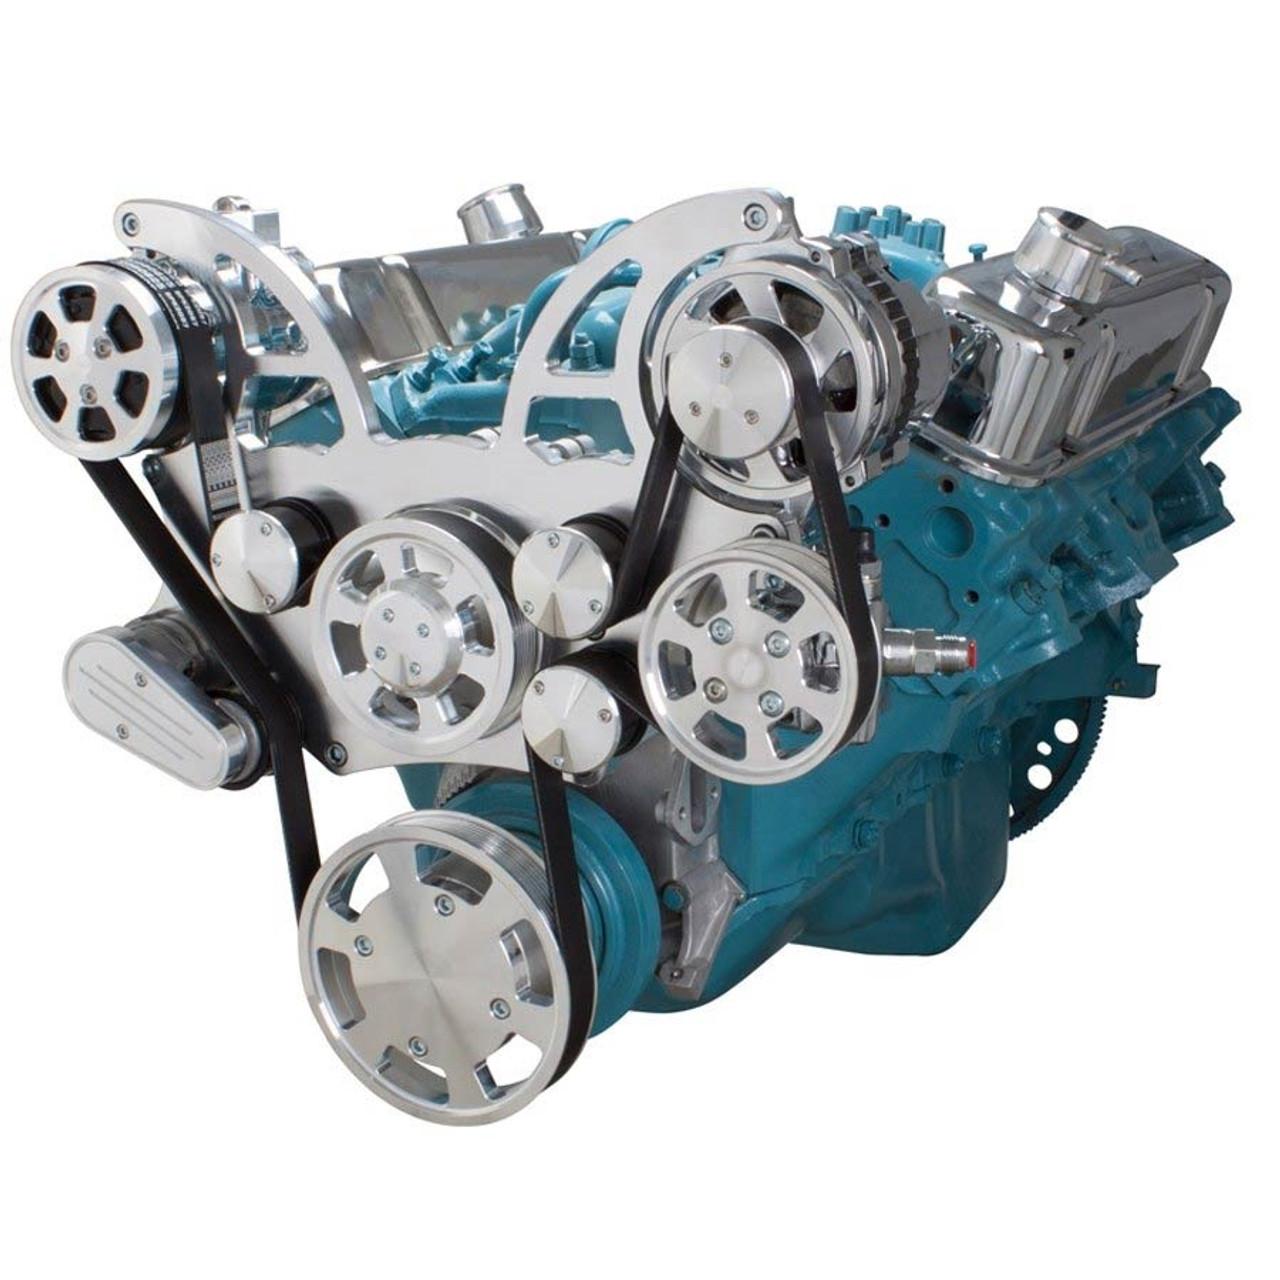 serpentine conversion kit for pontiac 350 400 428 455 v8 engines 2001 lexus is300 engine diagram pontiac 350 engine diagram [ 900 x 900 Pixel ]